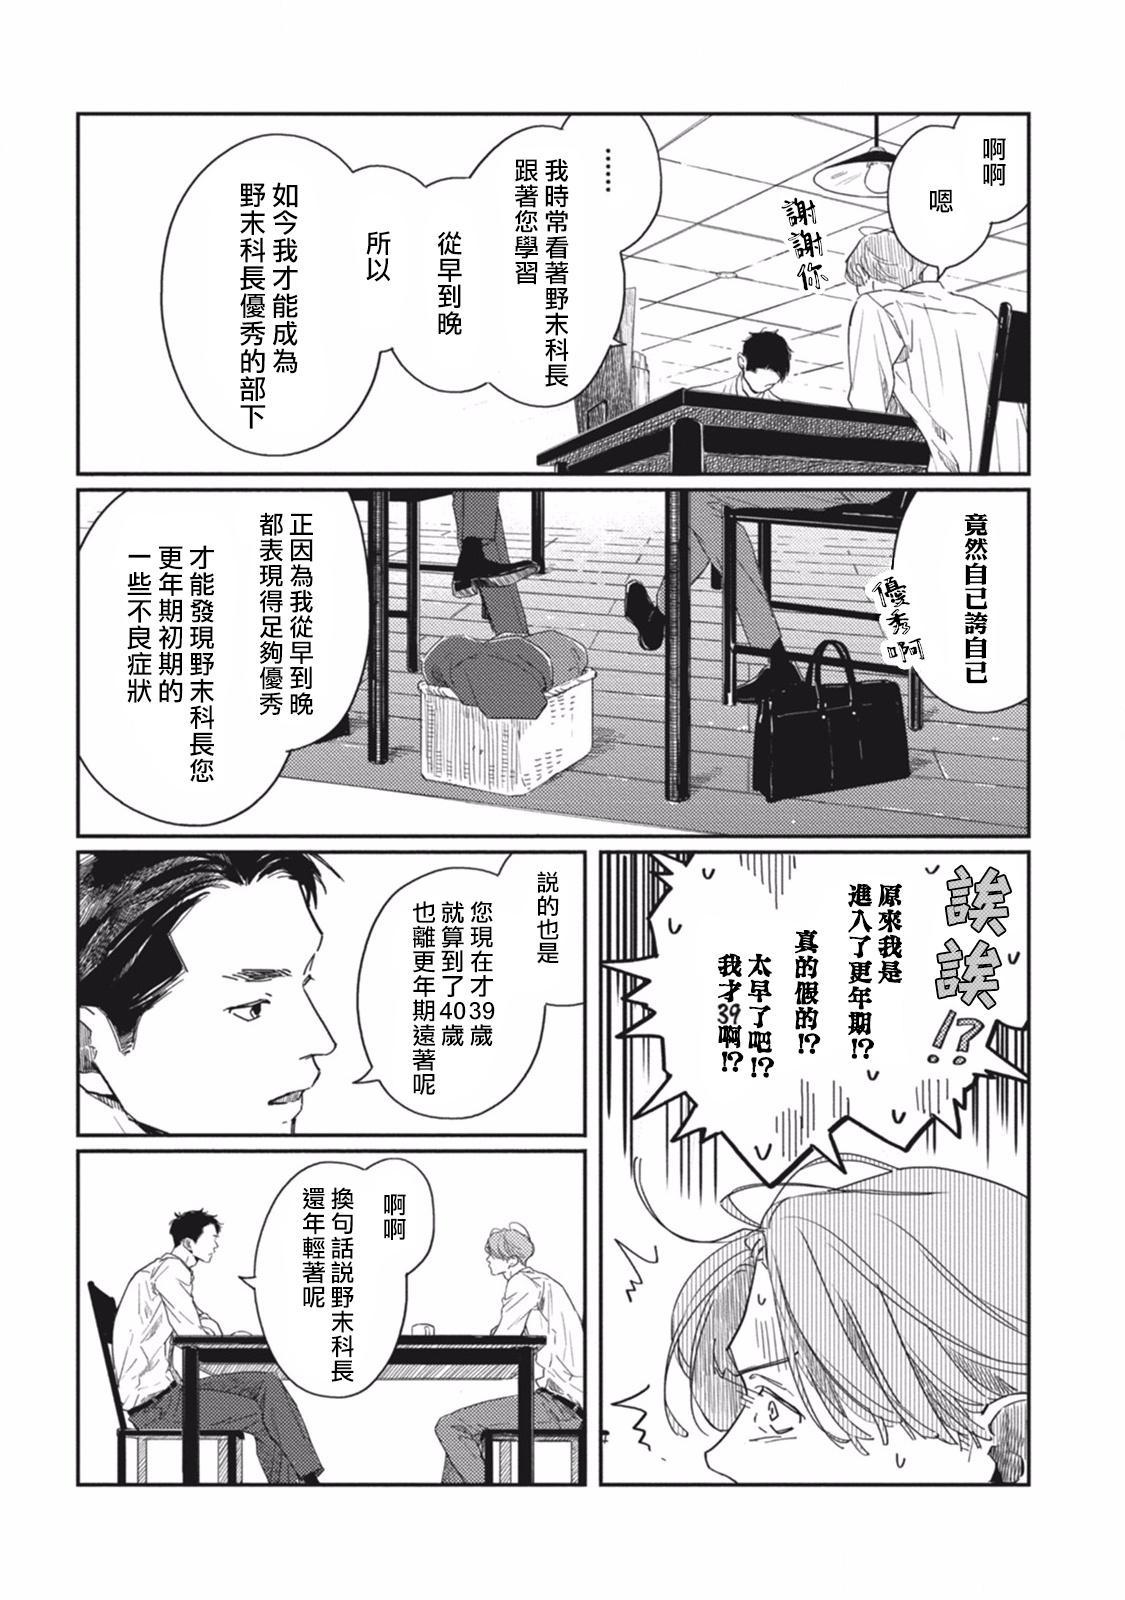 [Sagan Sagan] Old-fashioned Cupcake Ch. 1-2 [Chinese] [拾荒者汉化组] [Digital] 30